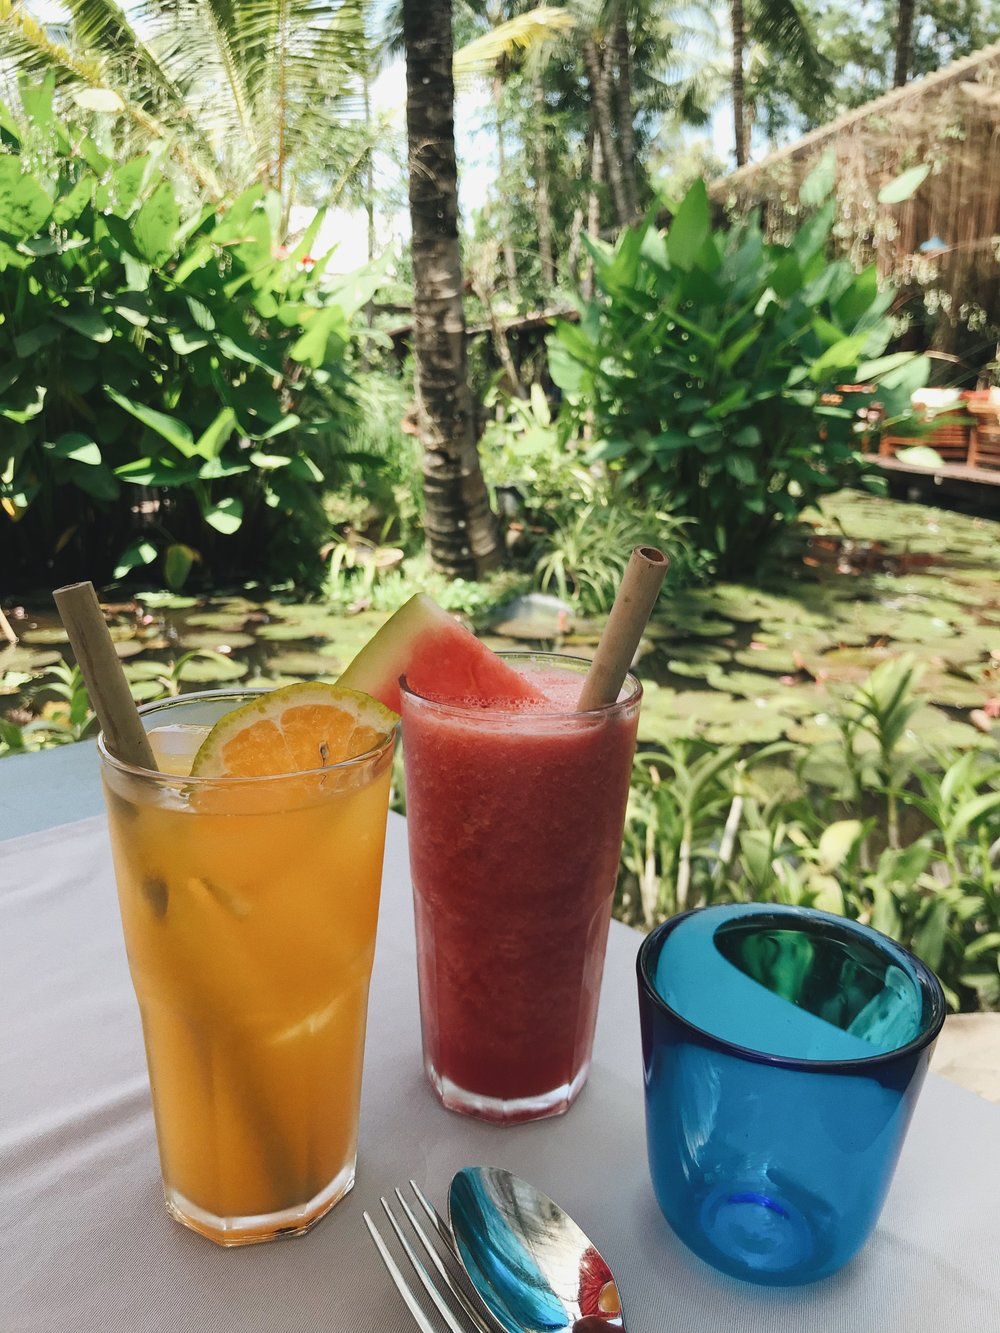 Fresh OJ and watermelon juice